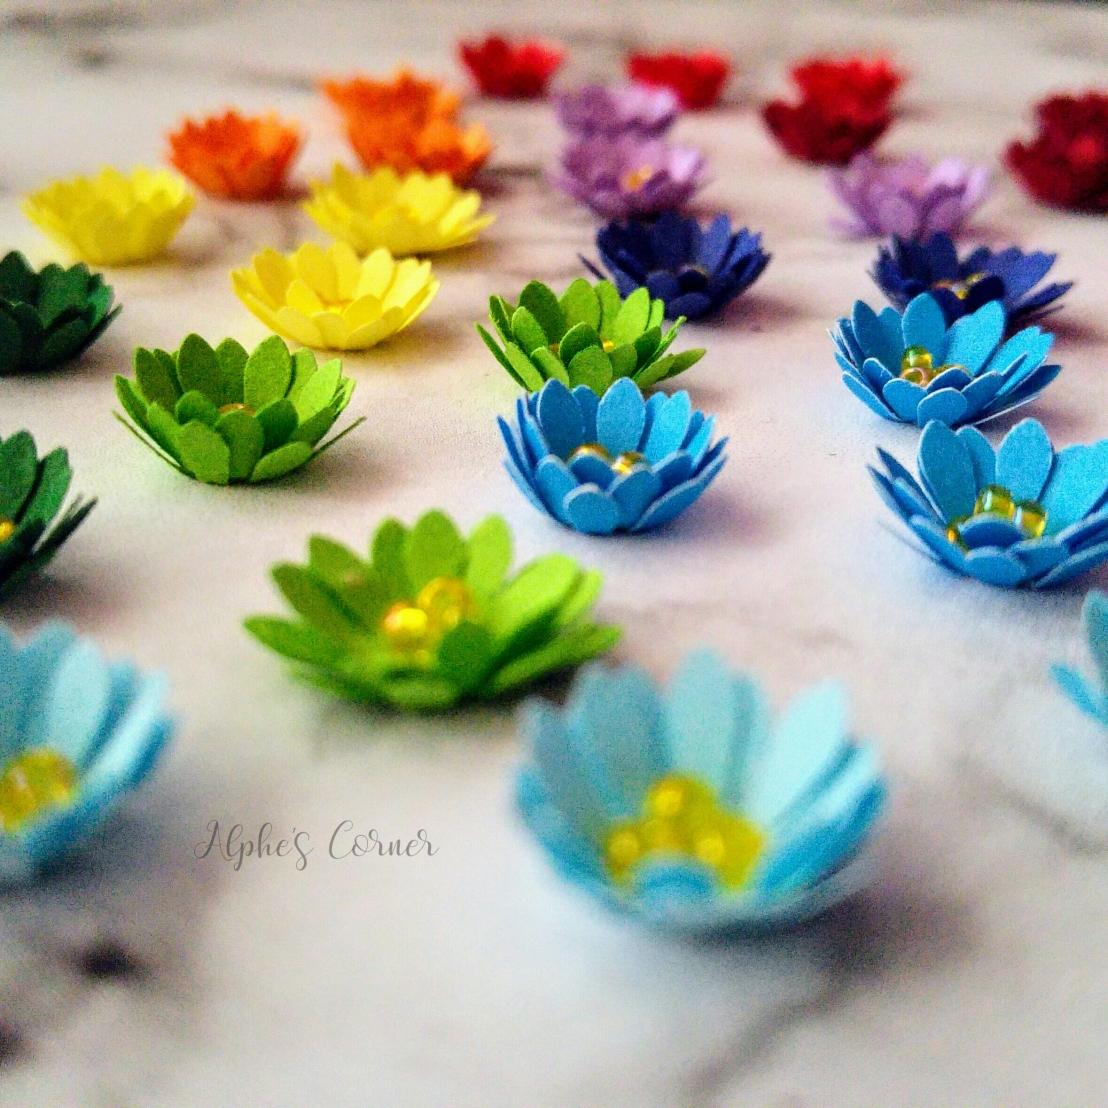 Colourful mini paper flowers